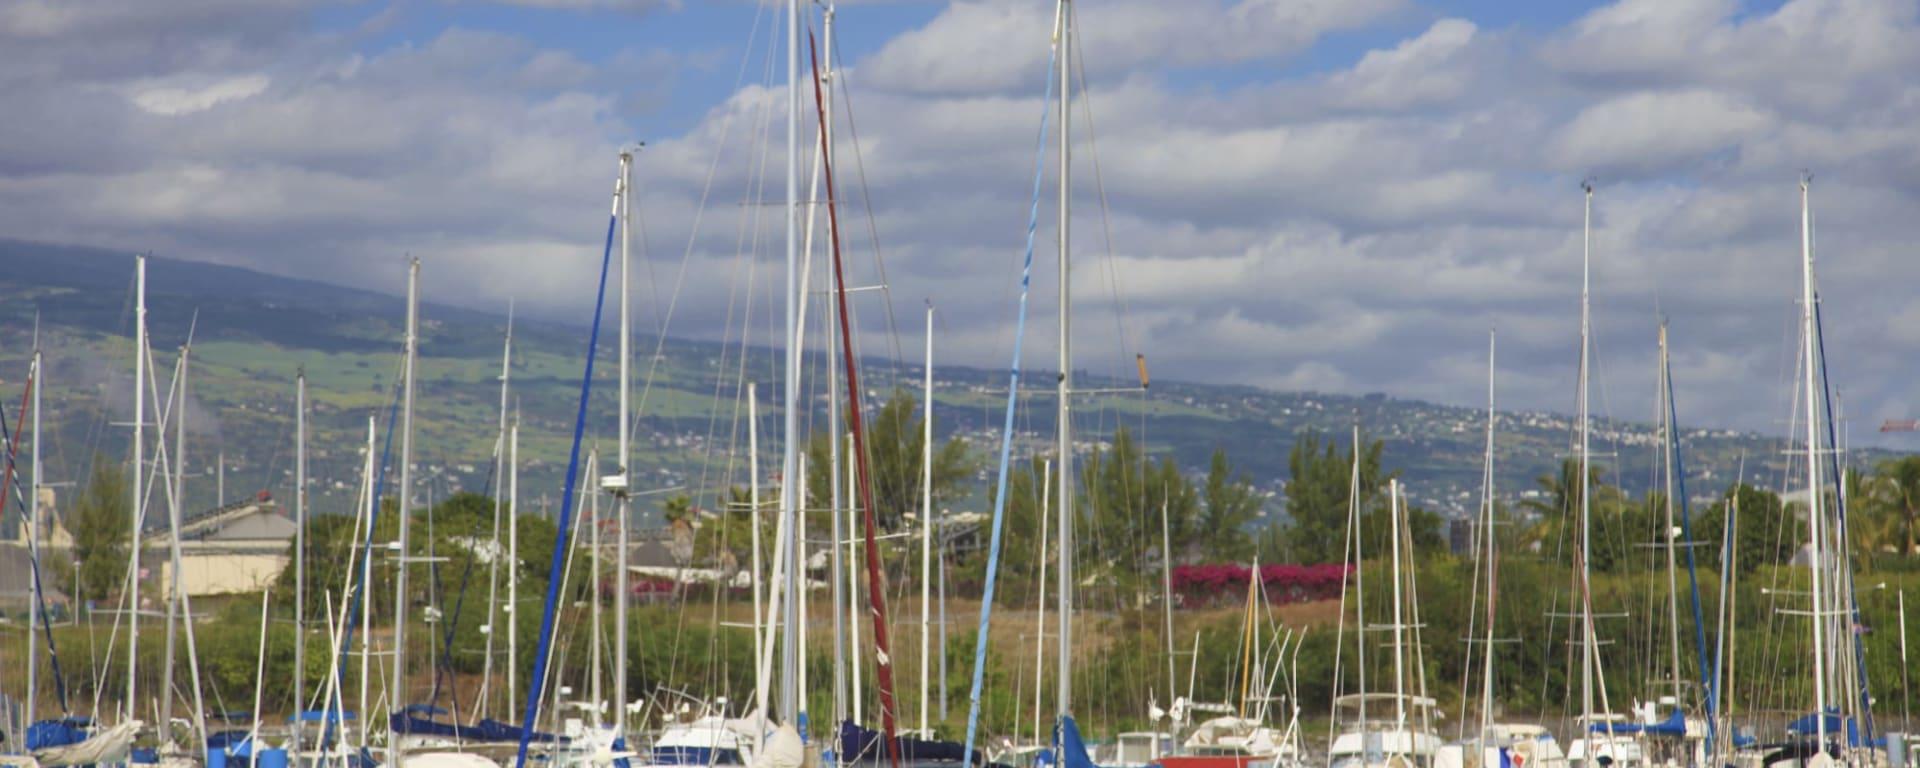 Piton Maido & St. Paul, FR, Halbtägig in Küstenregion: Réunion St. Paul Hafen